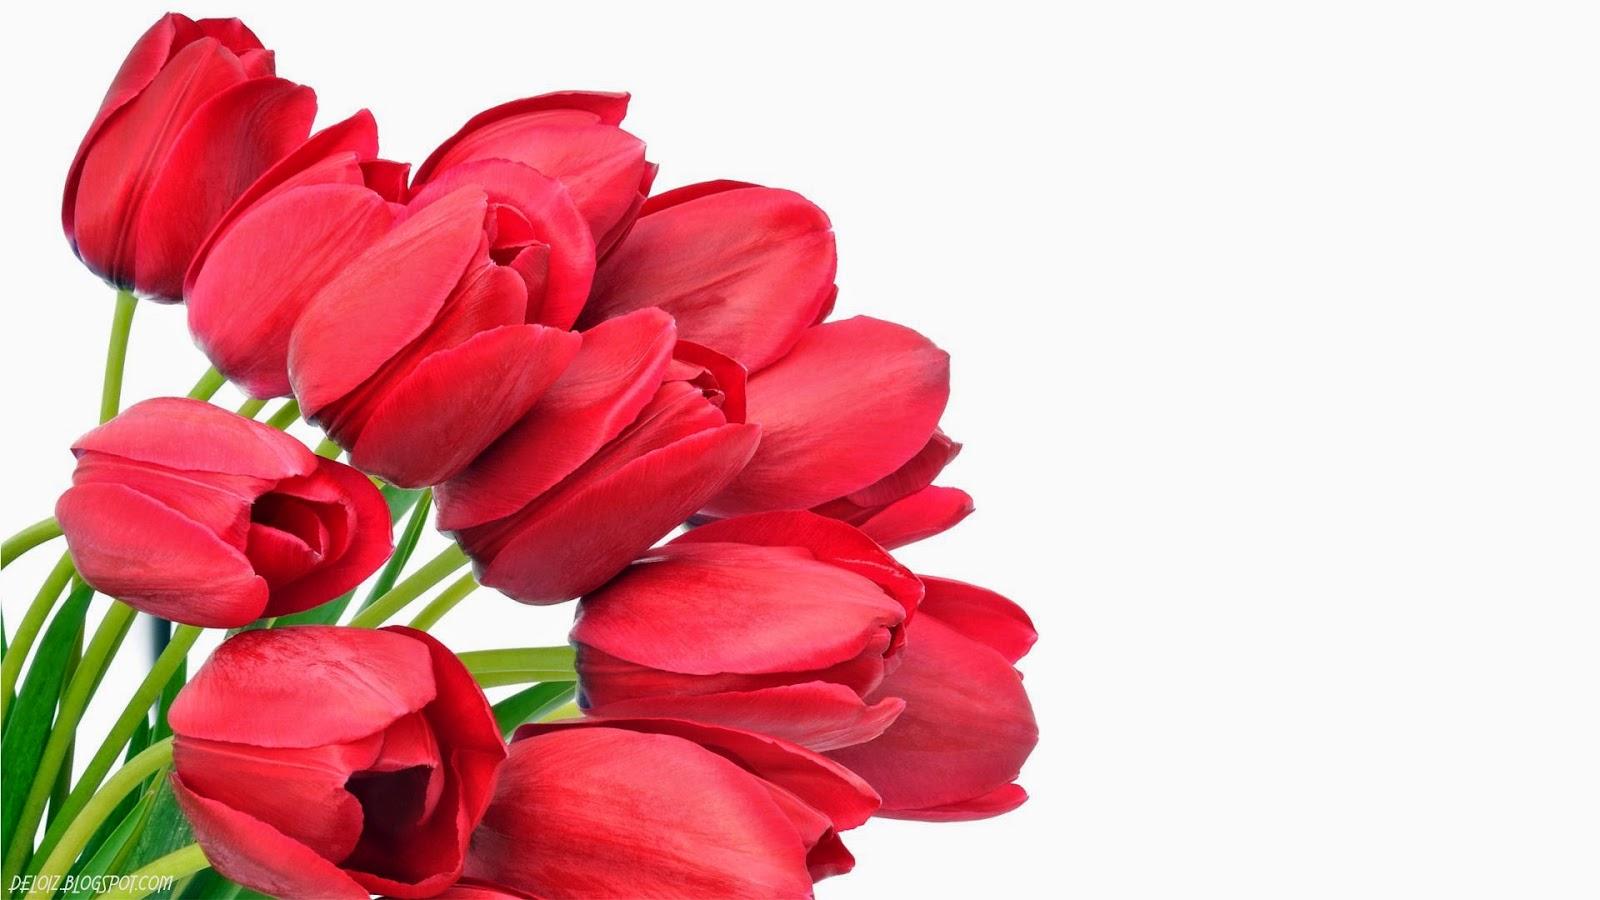 50 Gambar Bunga Cantik Dan Indah Sealkazz Blog